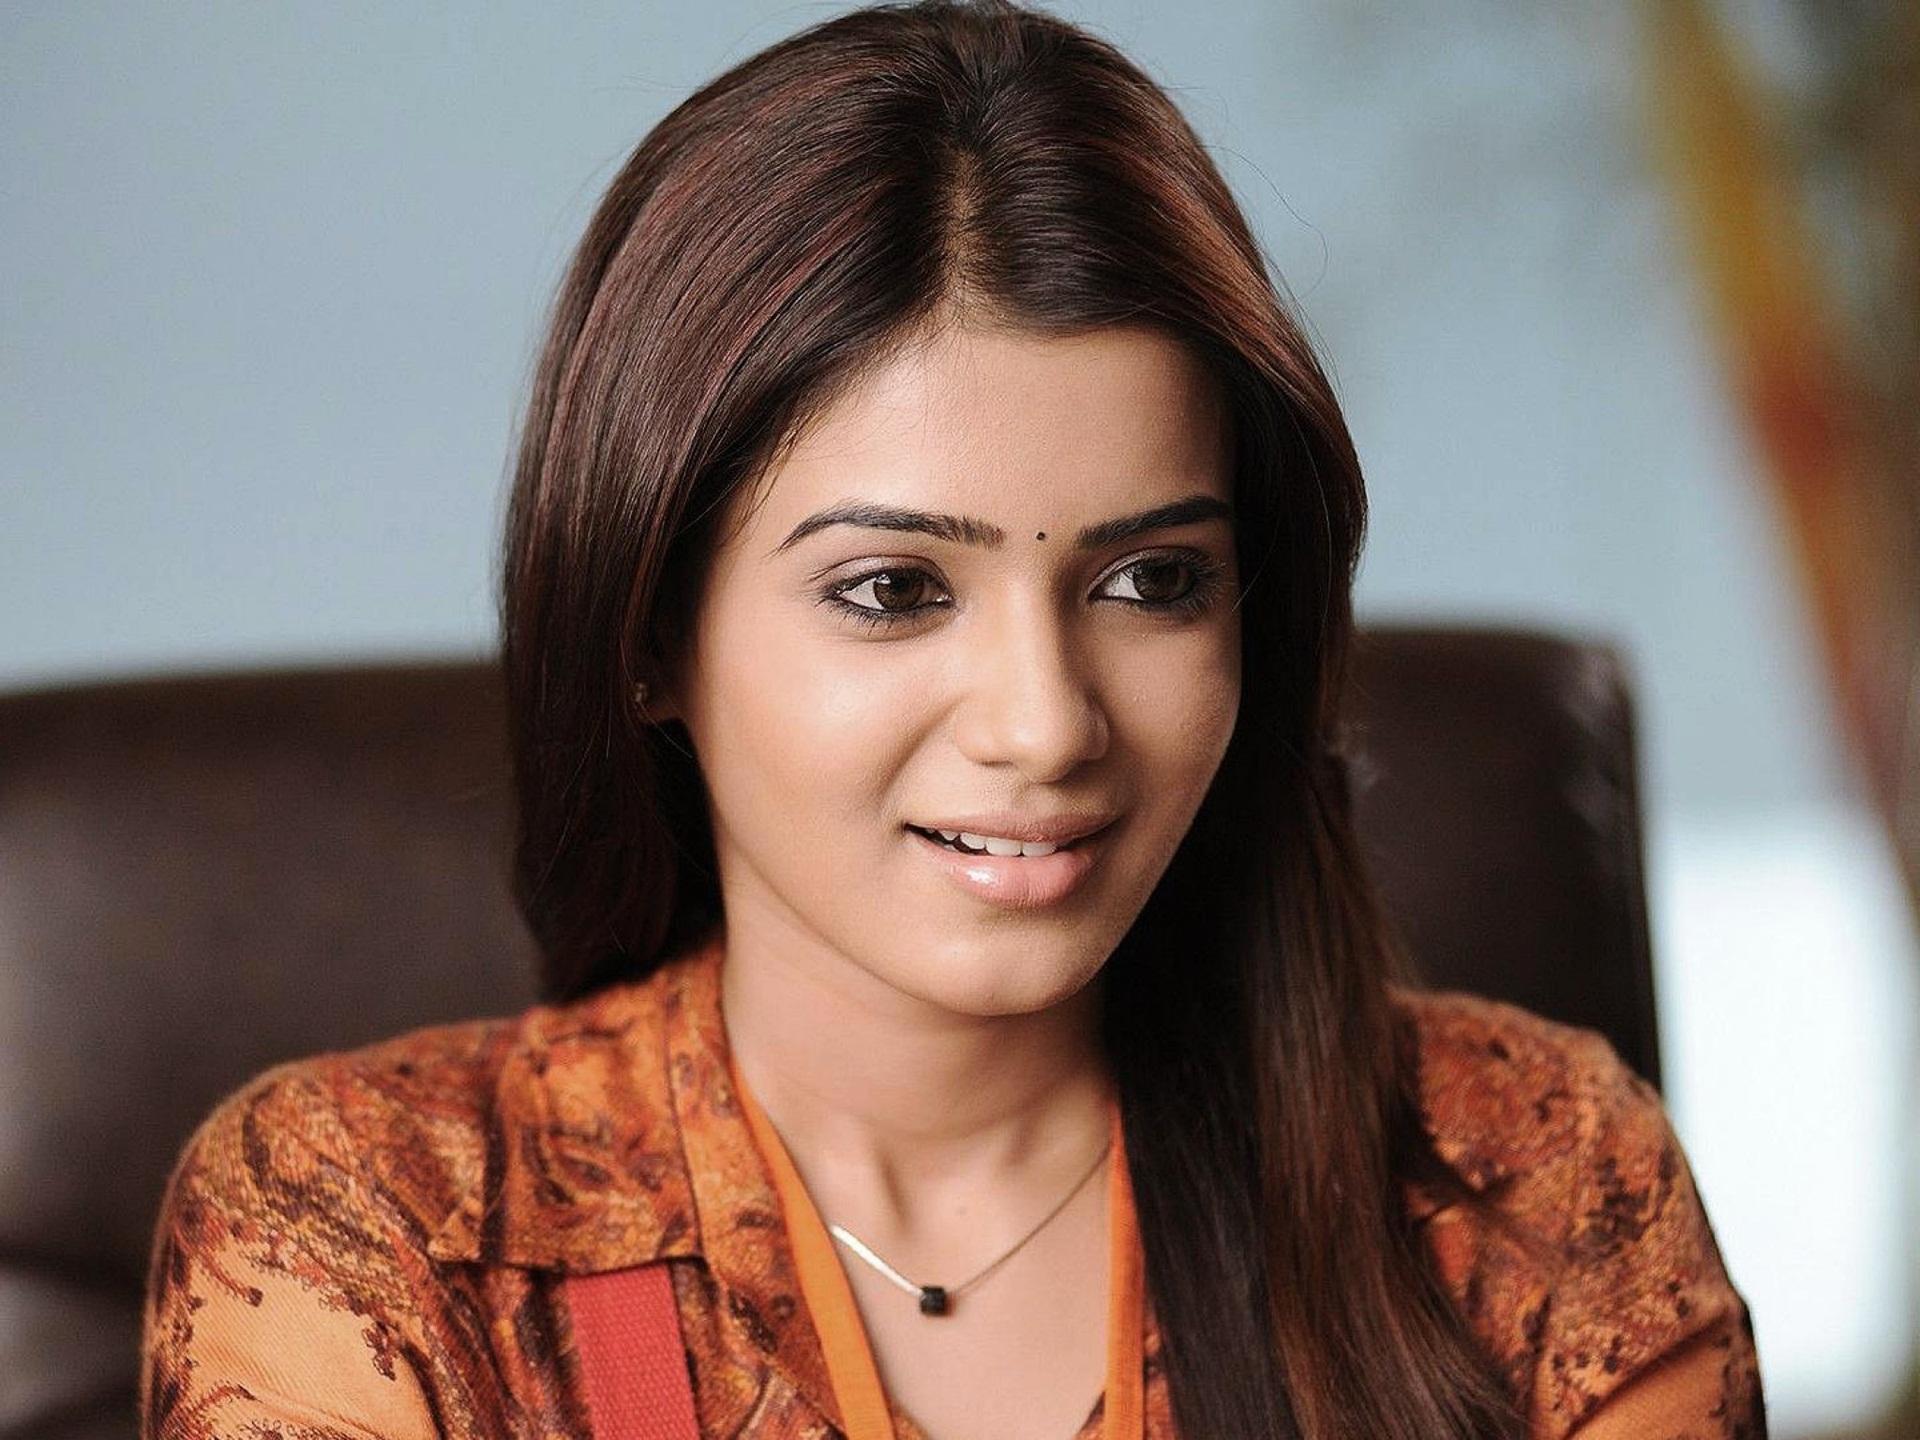 Makkhi Movie Hd Wallpaper Samantha Wallpapers Photos And Desktop Backgrounds Up To